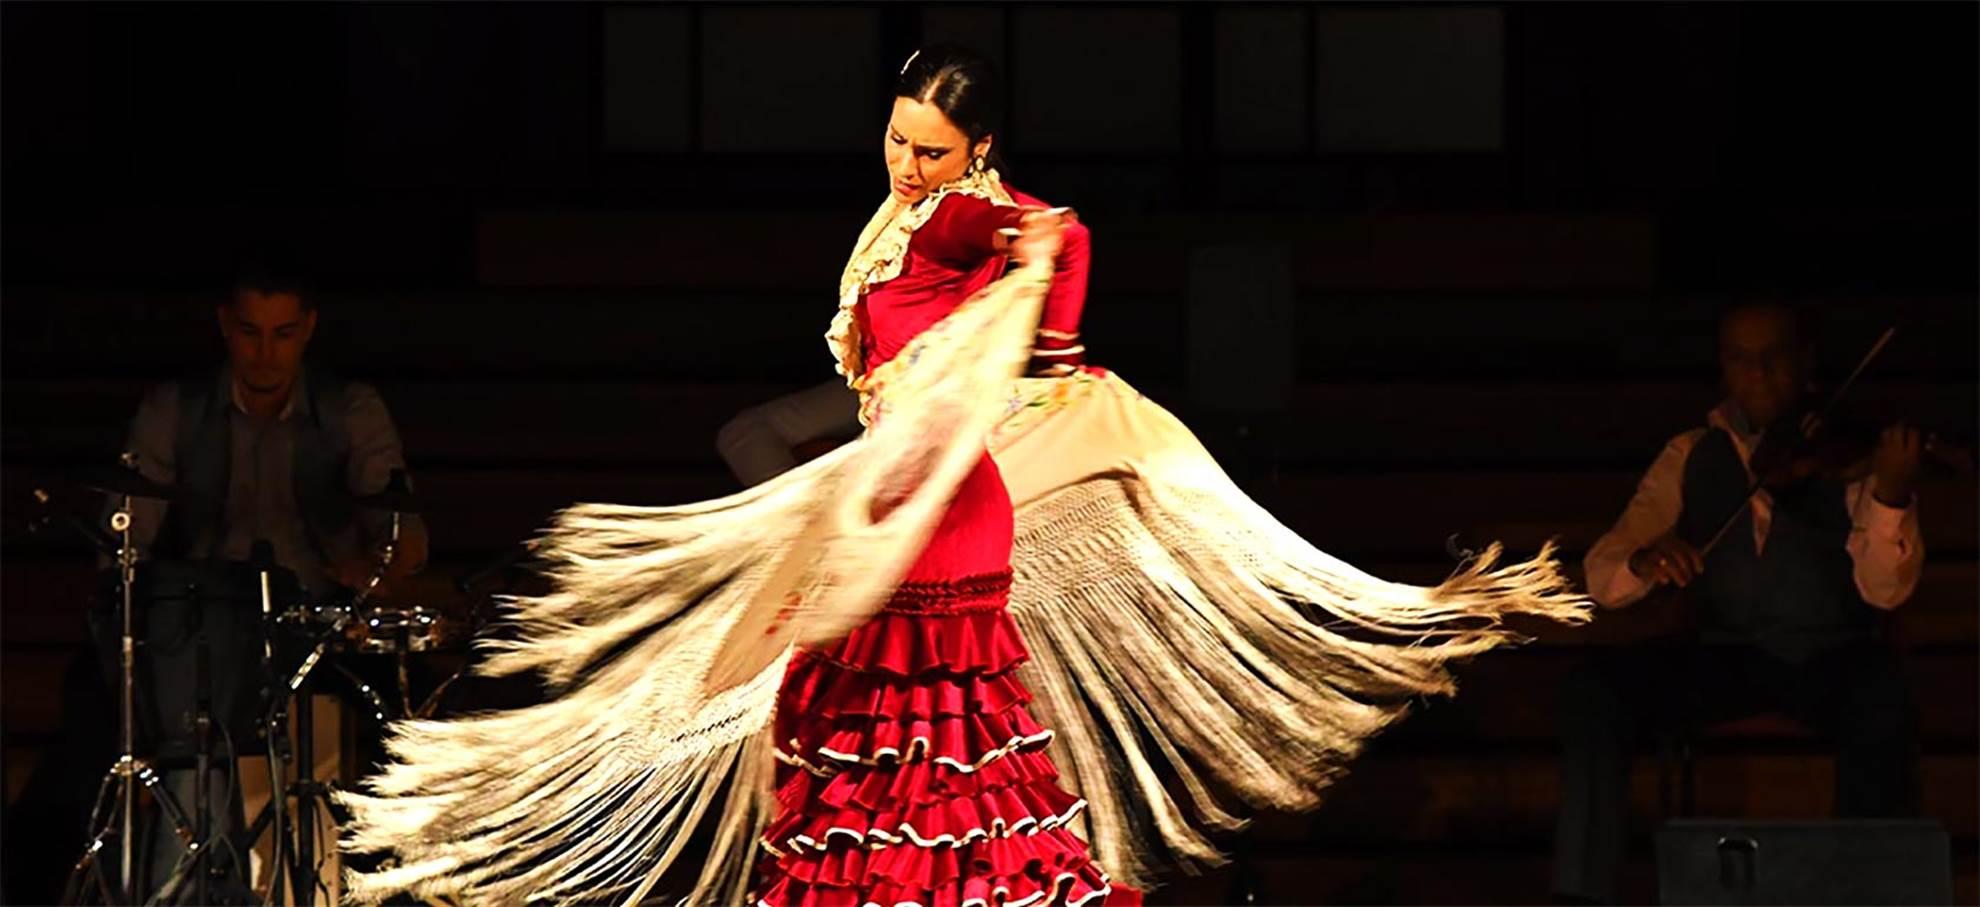 Ópera e Flamenco!